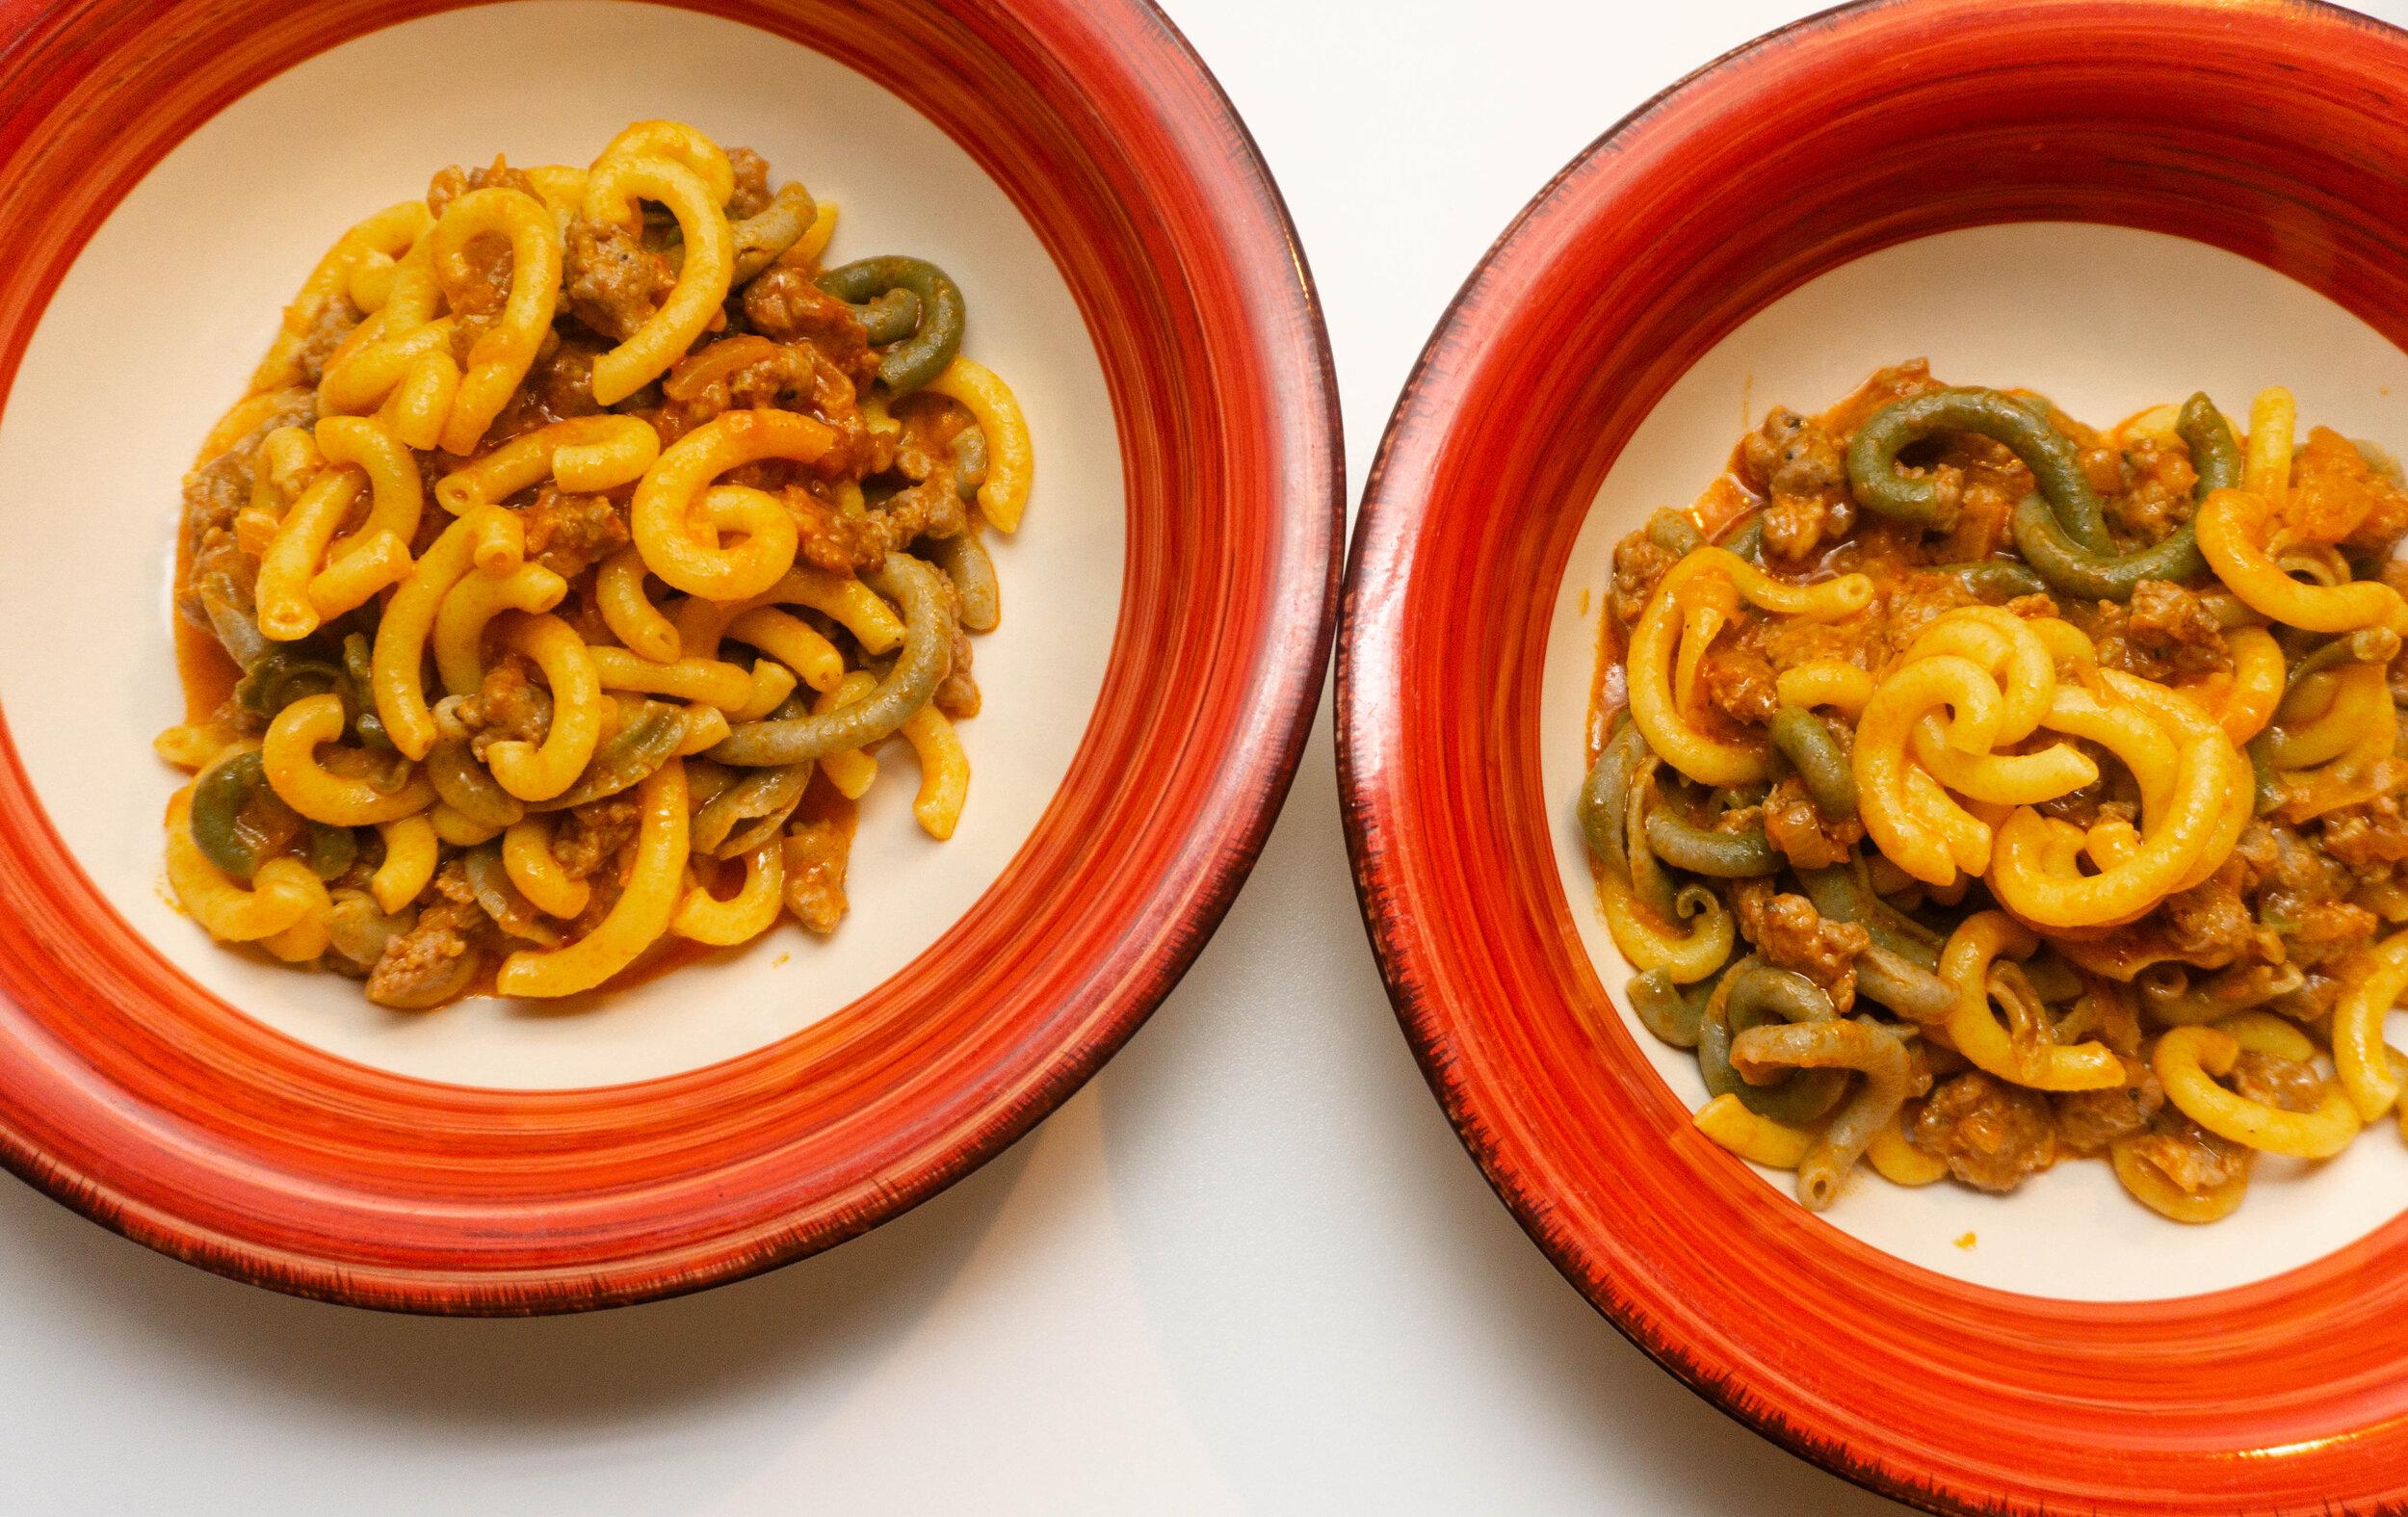 The best Gramigna alla Salsiccia in Reggio Emilia. Image courtesy of Helga from ShegoWandering.